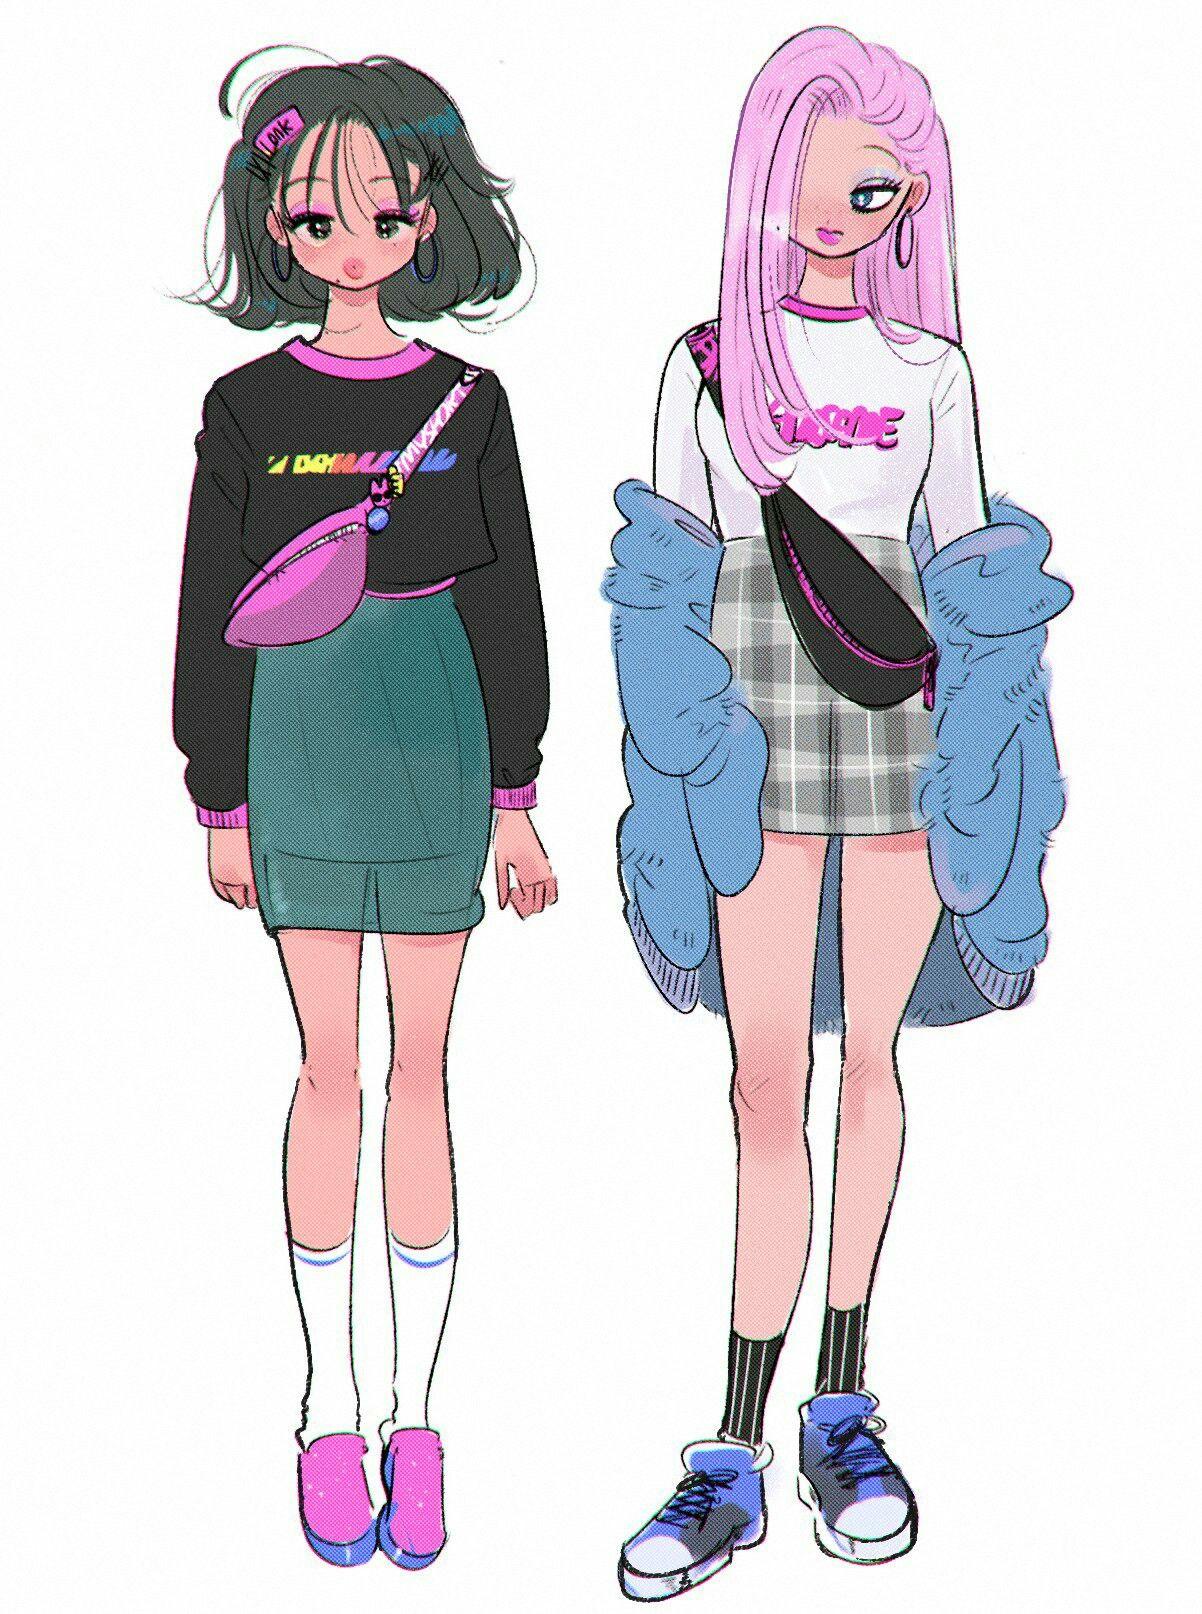 Moricky cute art styles art clothes girls illustration